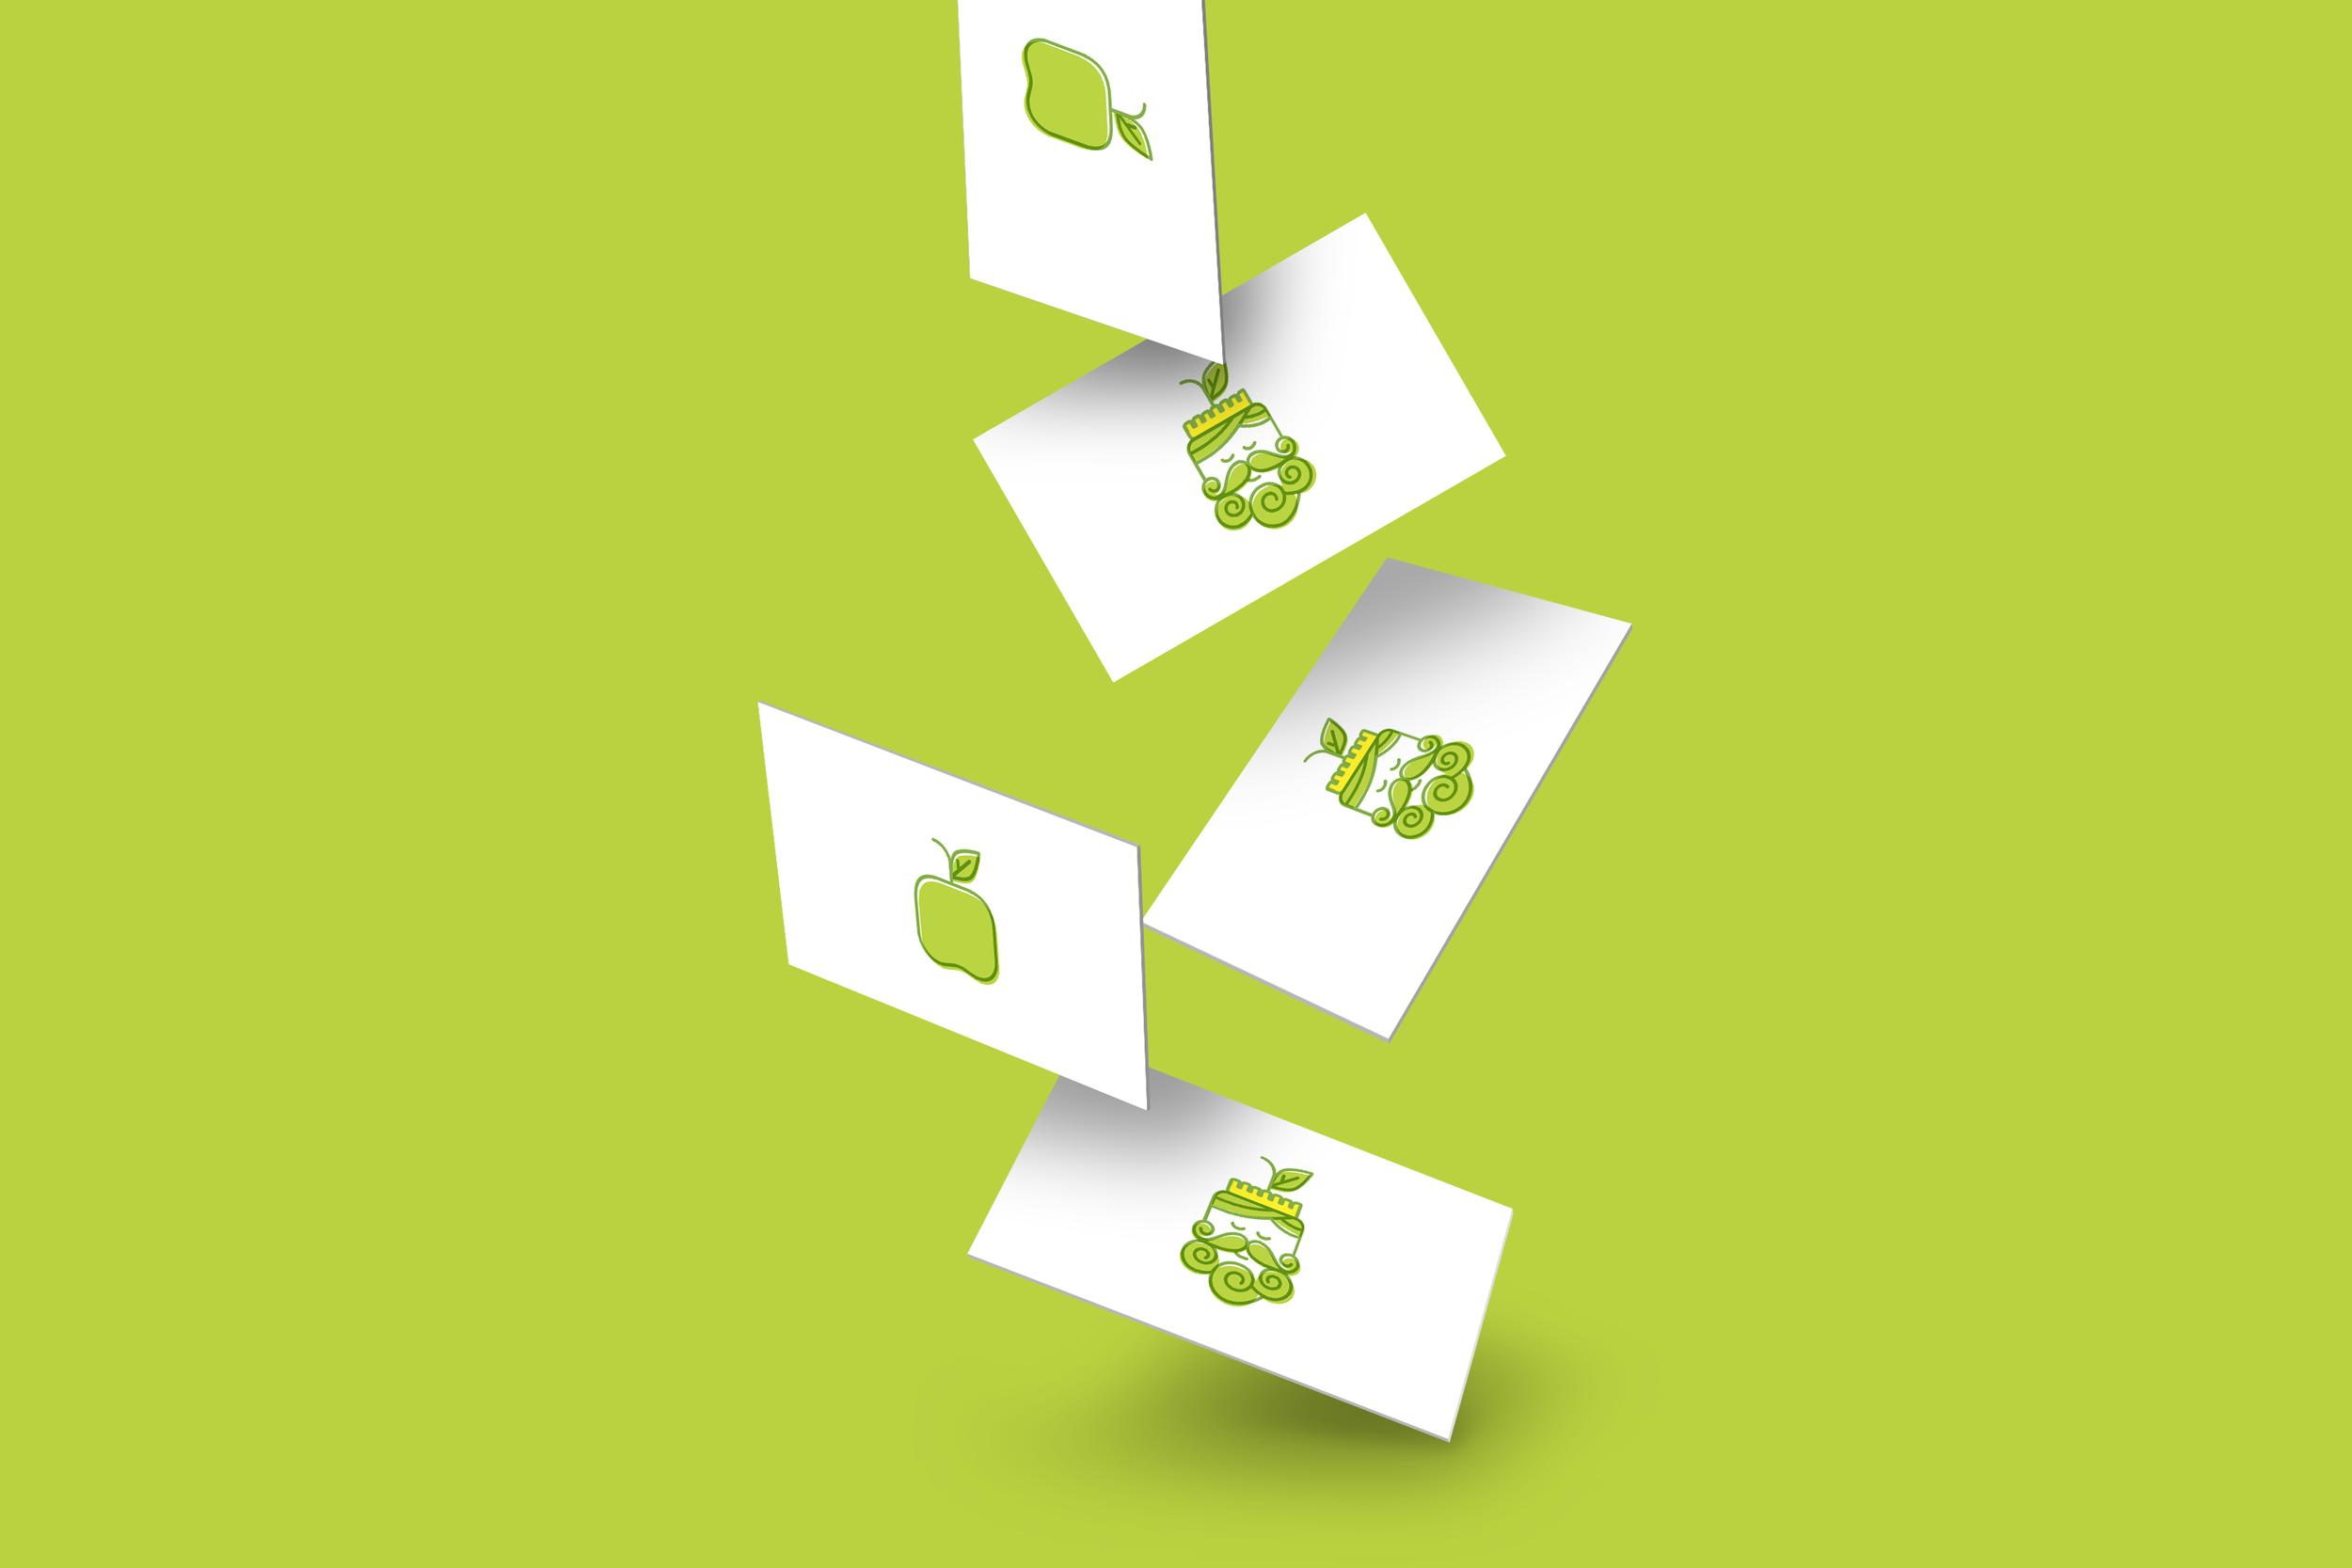 applezeus_cards-green.png